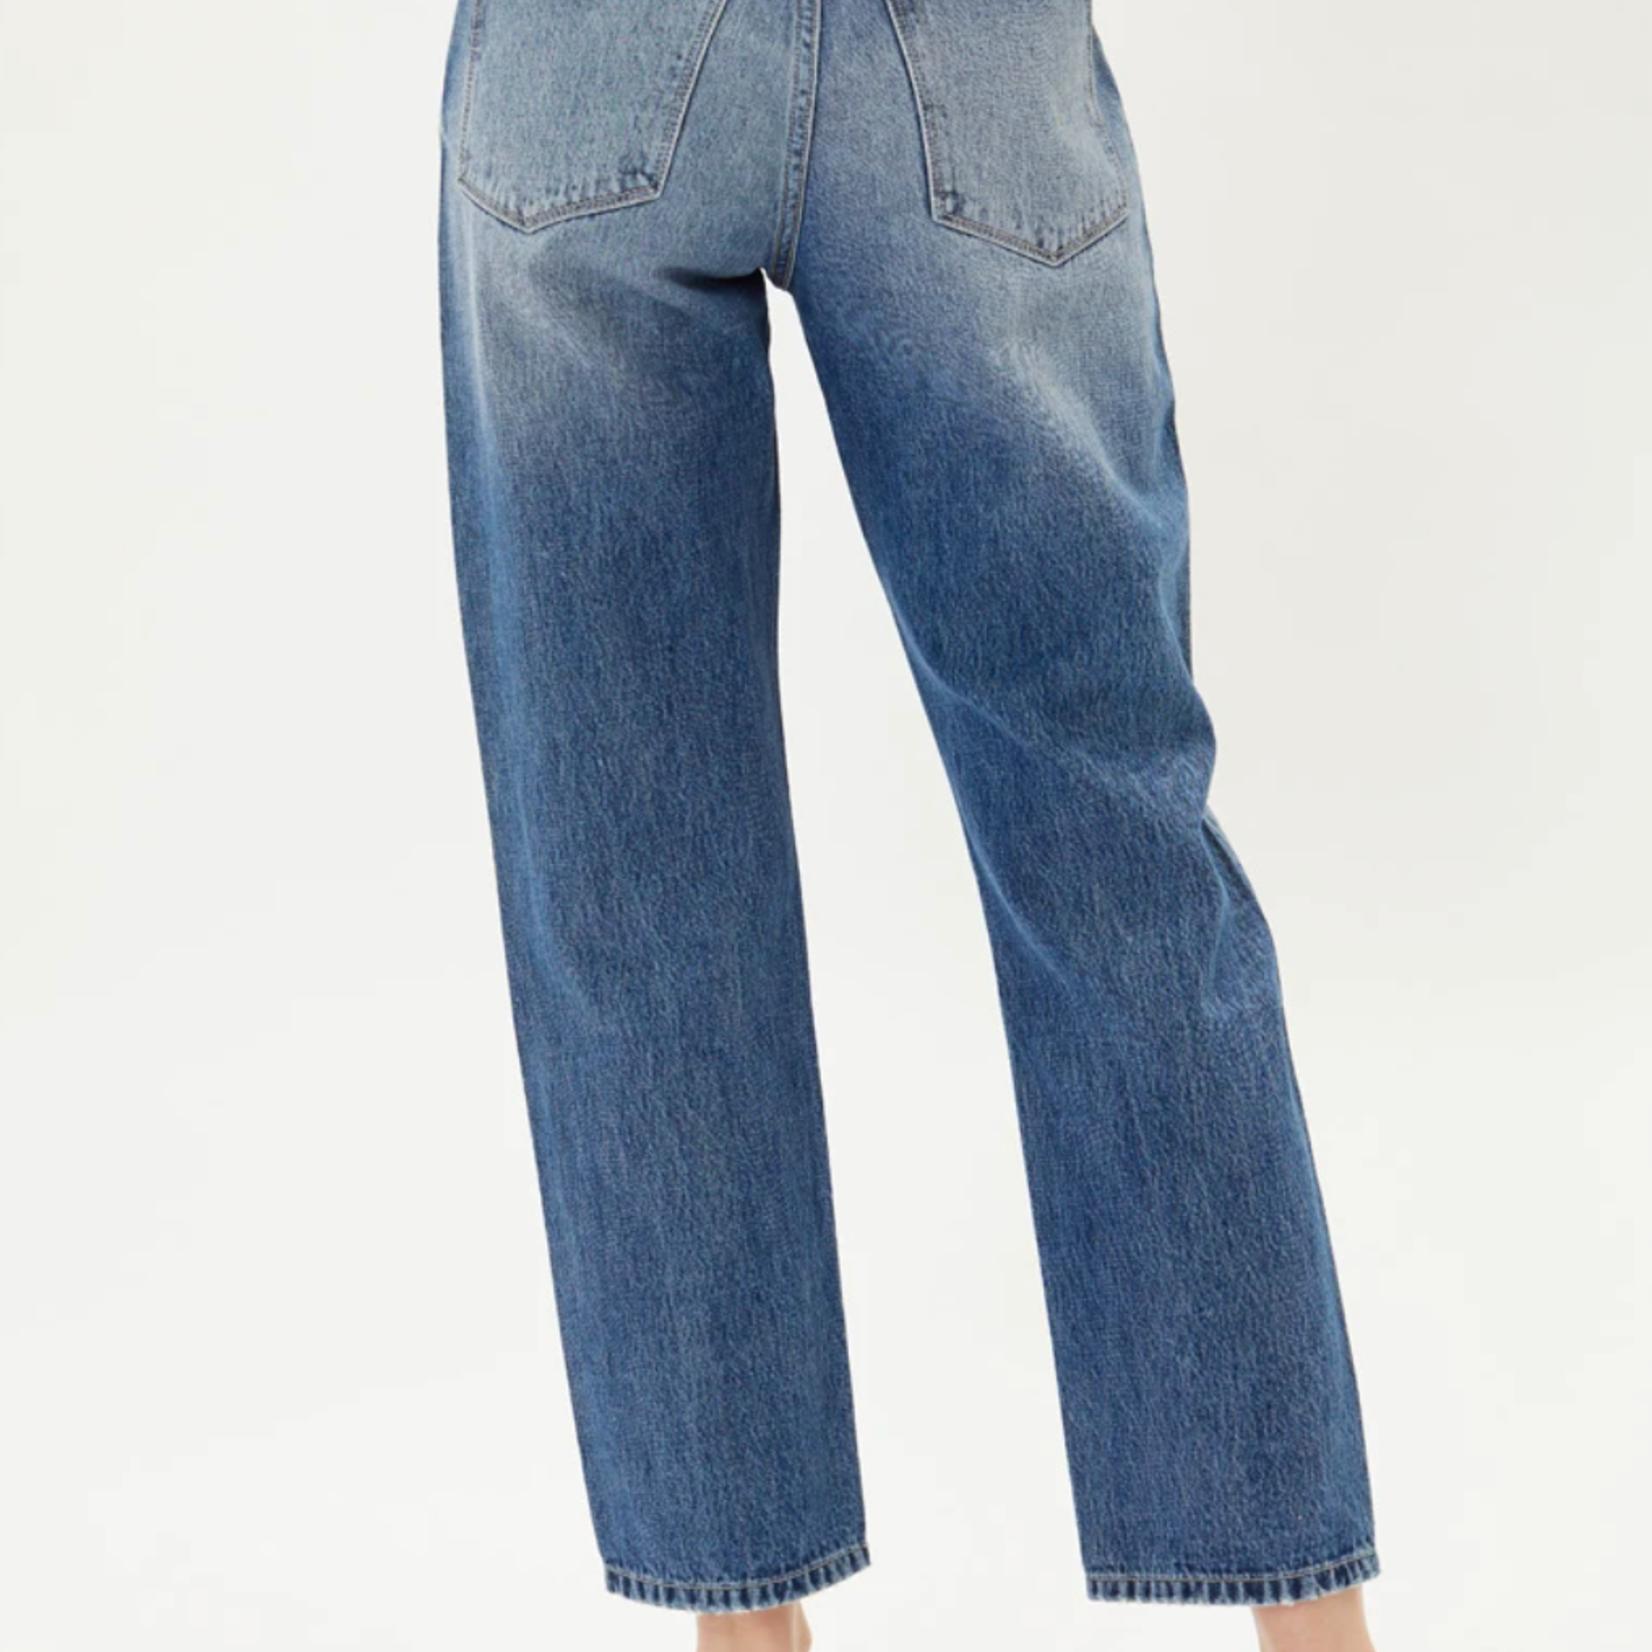 Kancan Silvana Ultra High Rise 90's Boyfriend Jeans